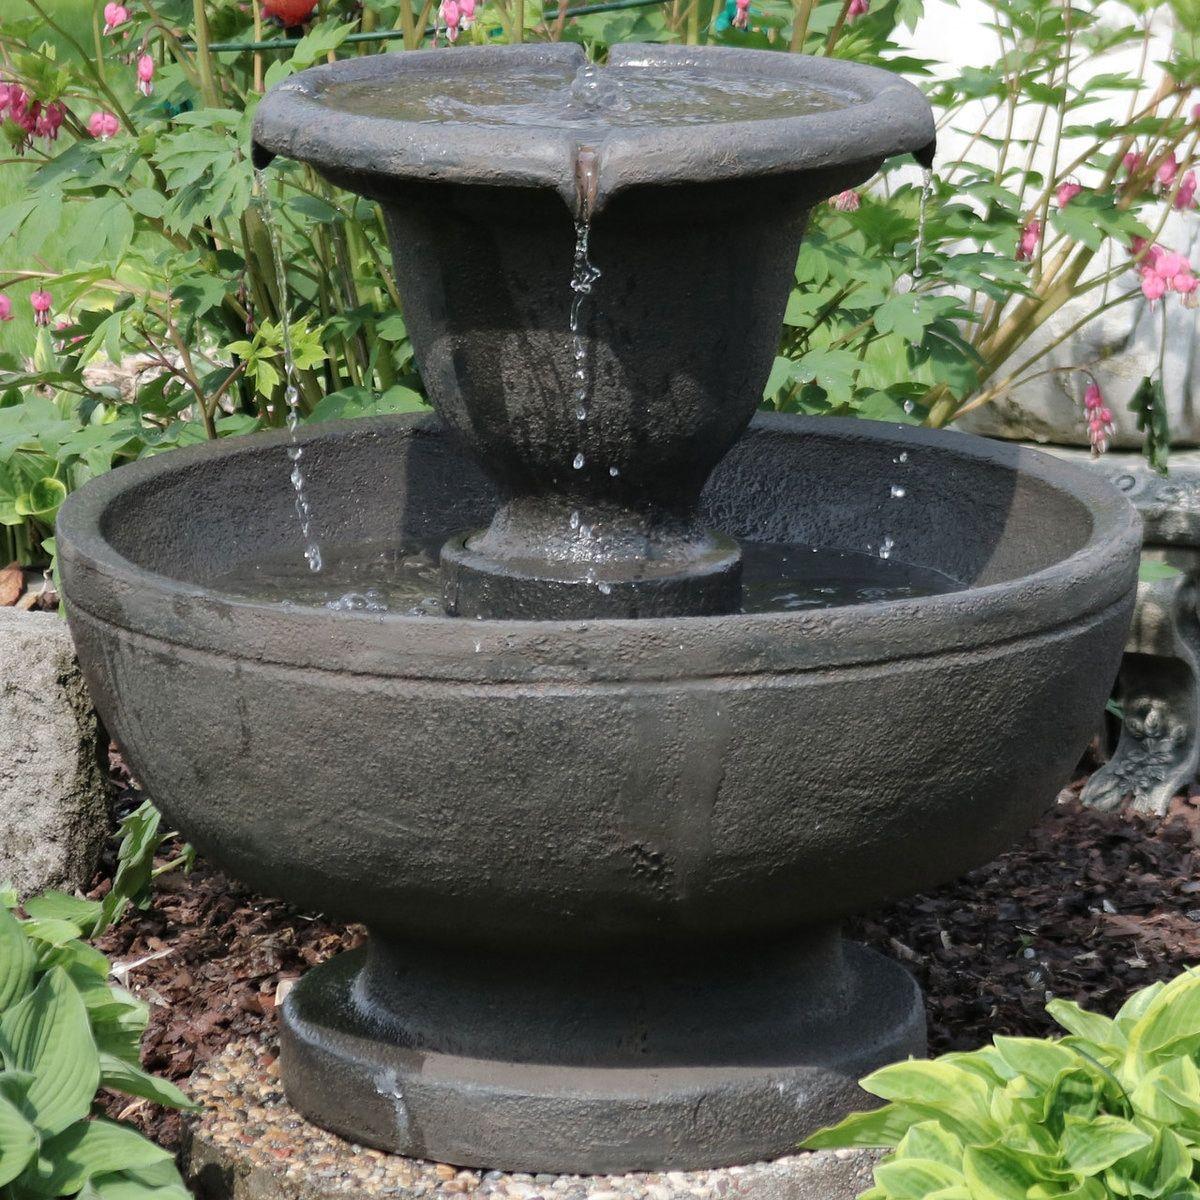 Sunnydaze Scrolled Vessel 2 Tier Outdoor Water Fountain 28 Inch Tall Garden Water Fountains Water Fountains Outdoor Water Fountain